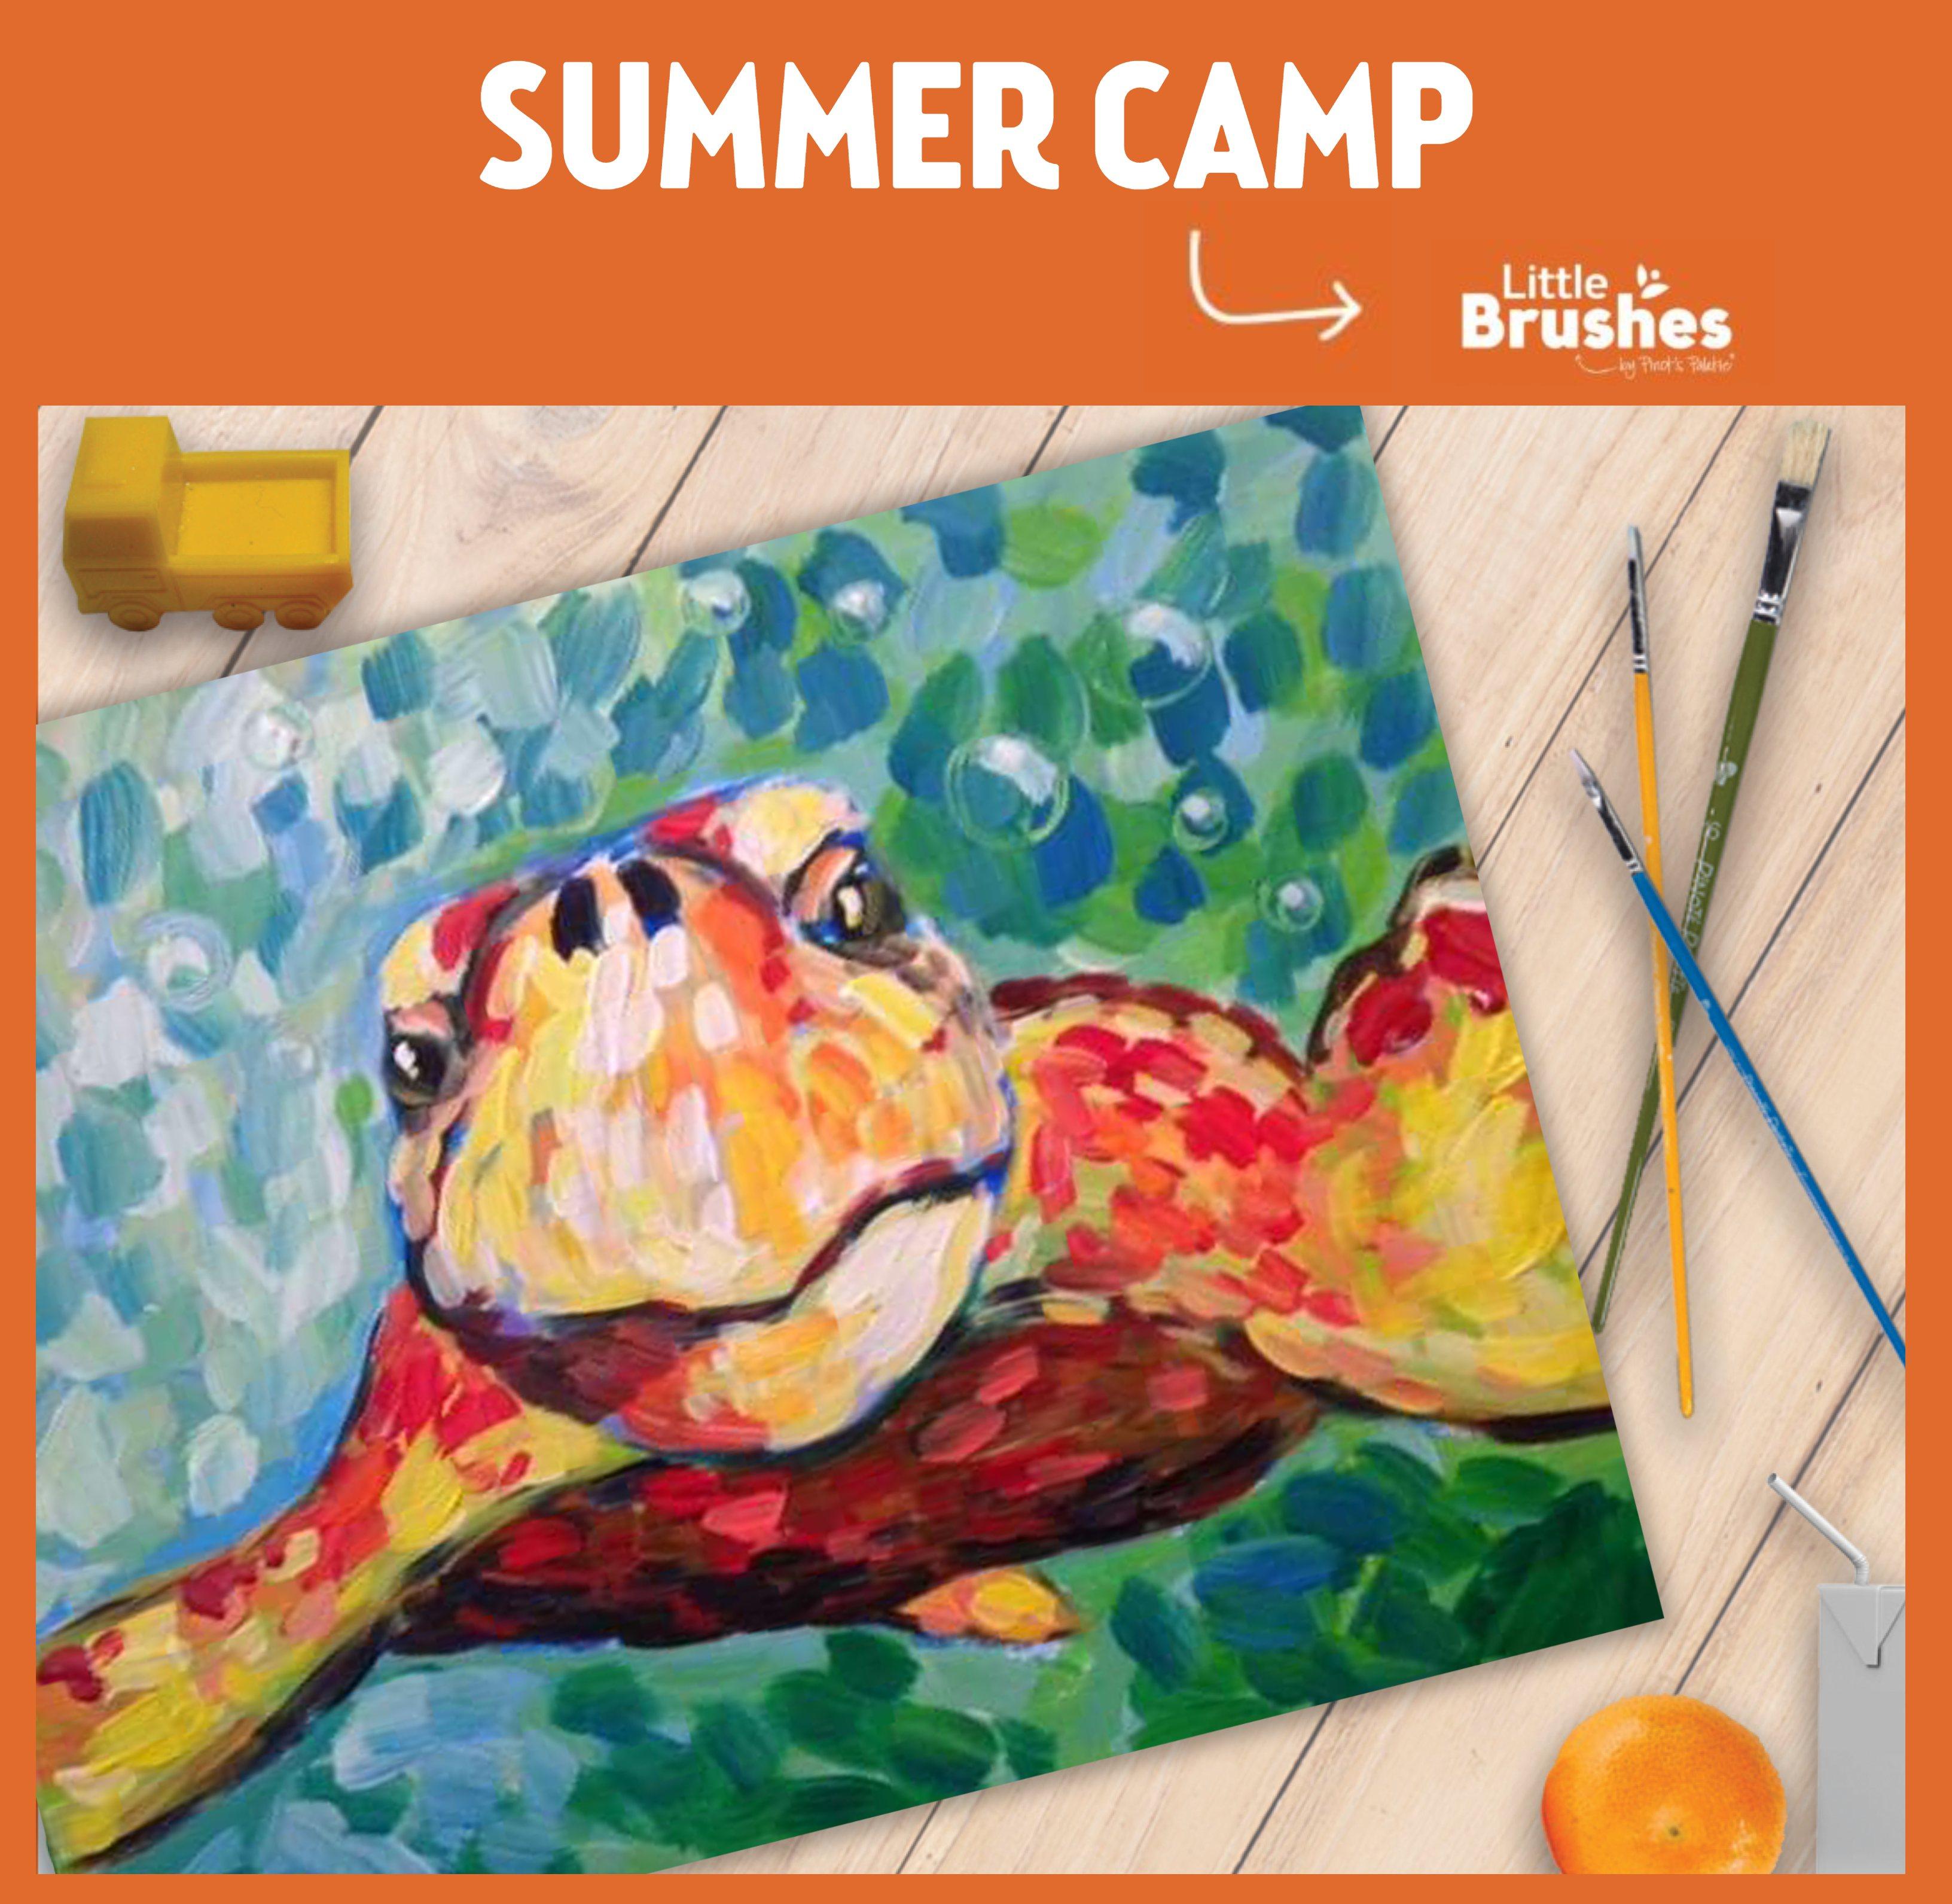 Little Brushes: Summer Camp